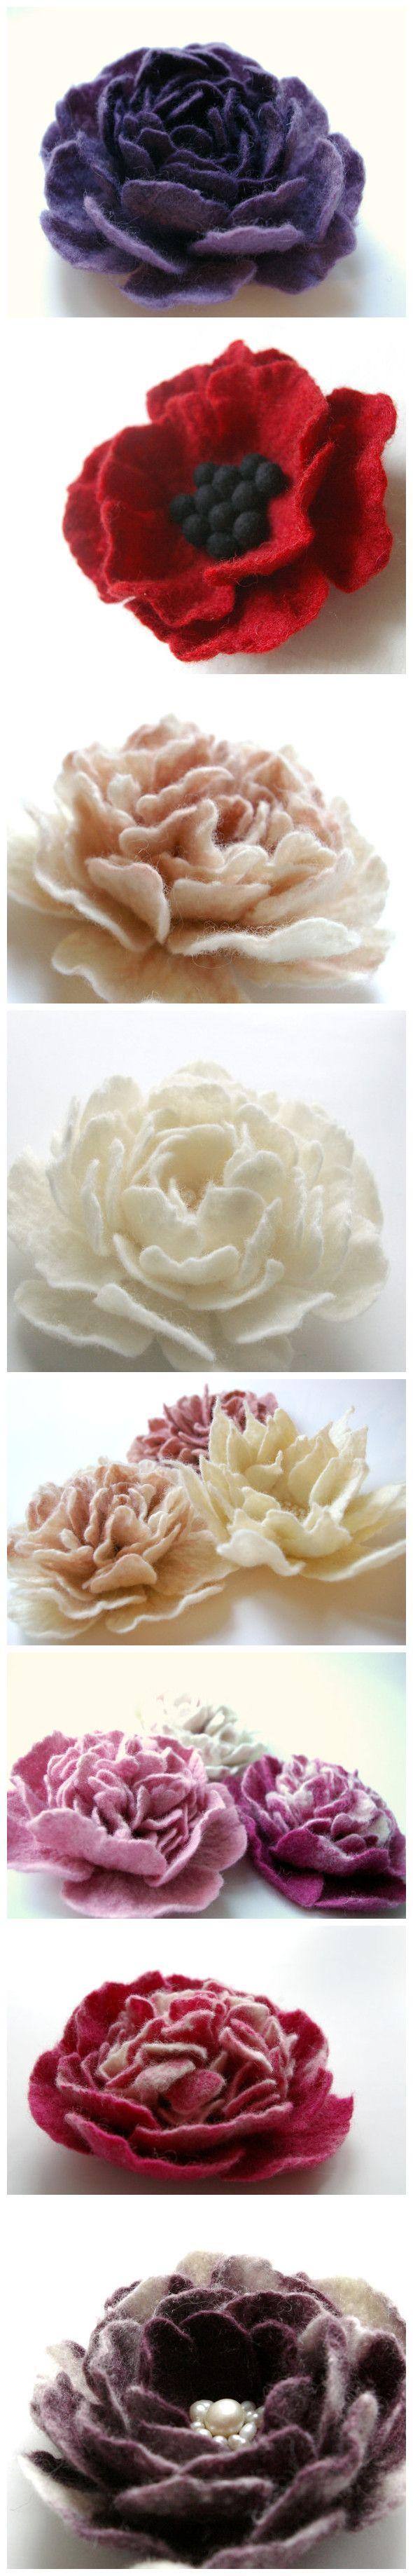 uusi luettelo tukkumyyjä Viimeisin muoti Felt Handmade Flowers #millinery #judithm #flowers ...